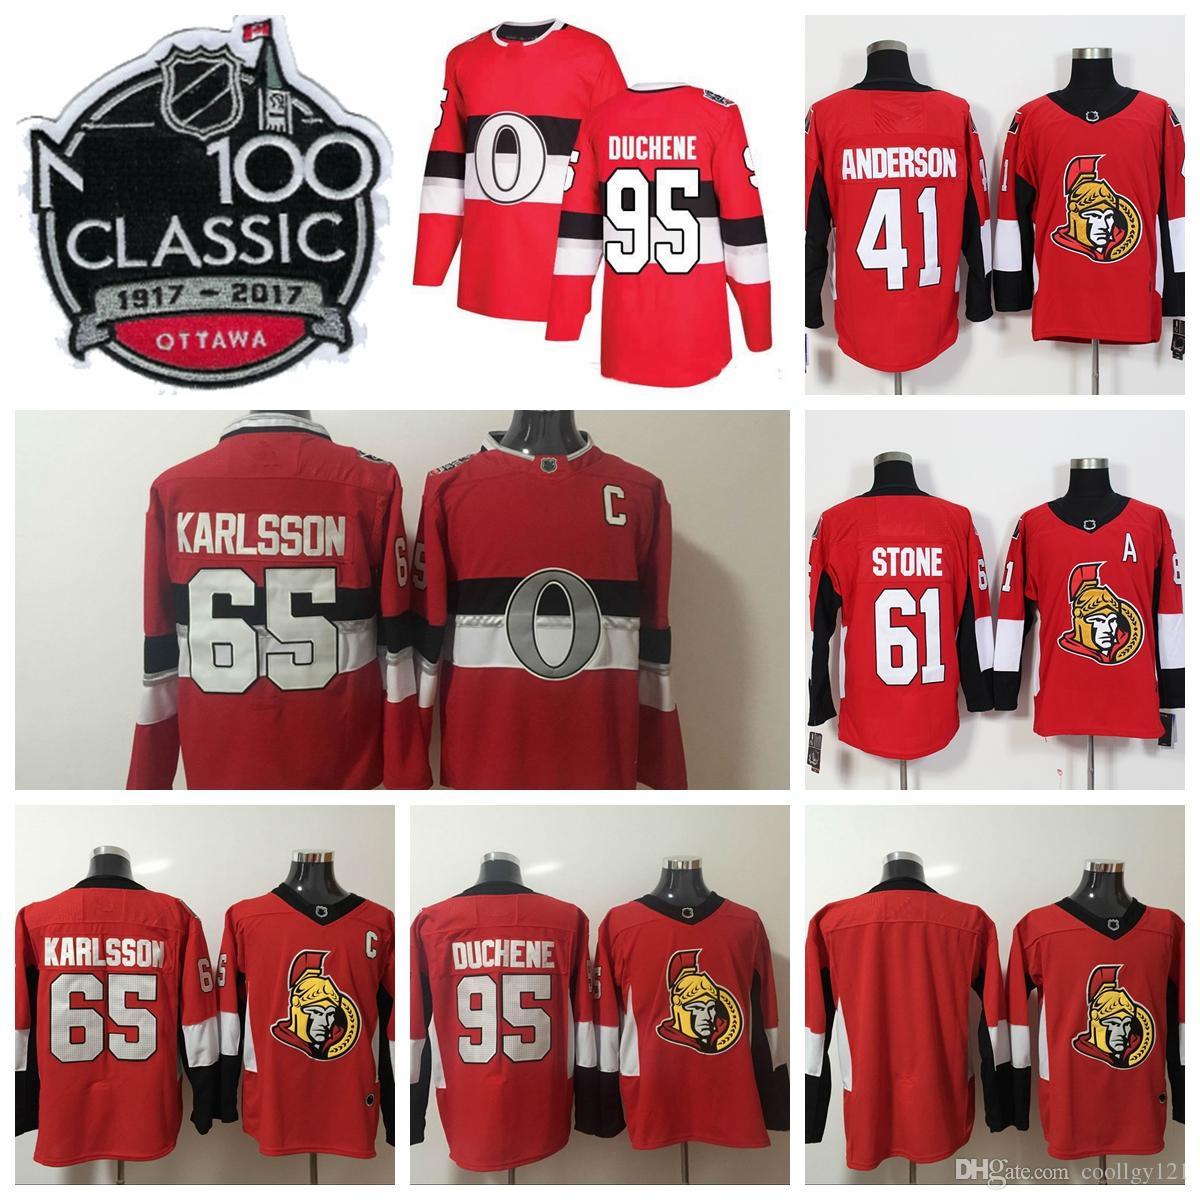 3836a0814ec ... denmark 2019 2018 ad 100th classic ottawa senators jersey 65 erik  karlsson jersey 95 matt duchene